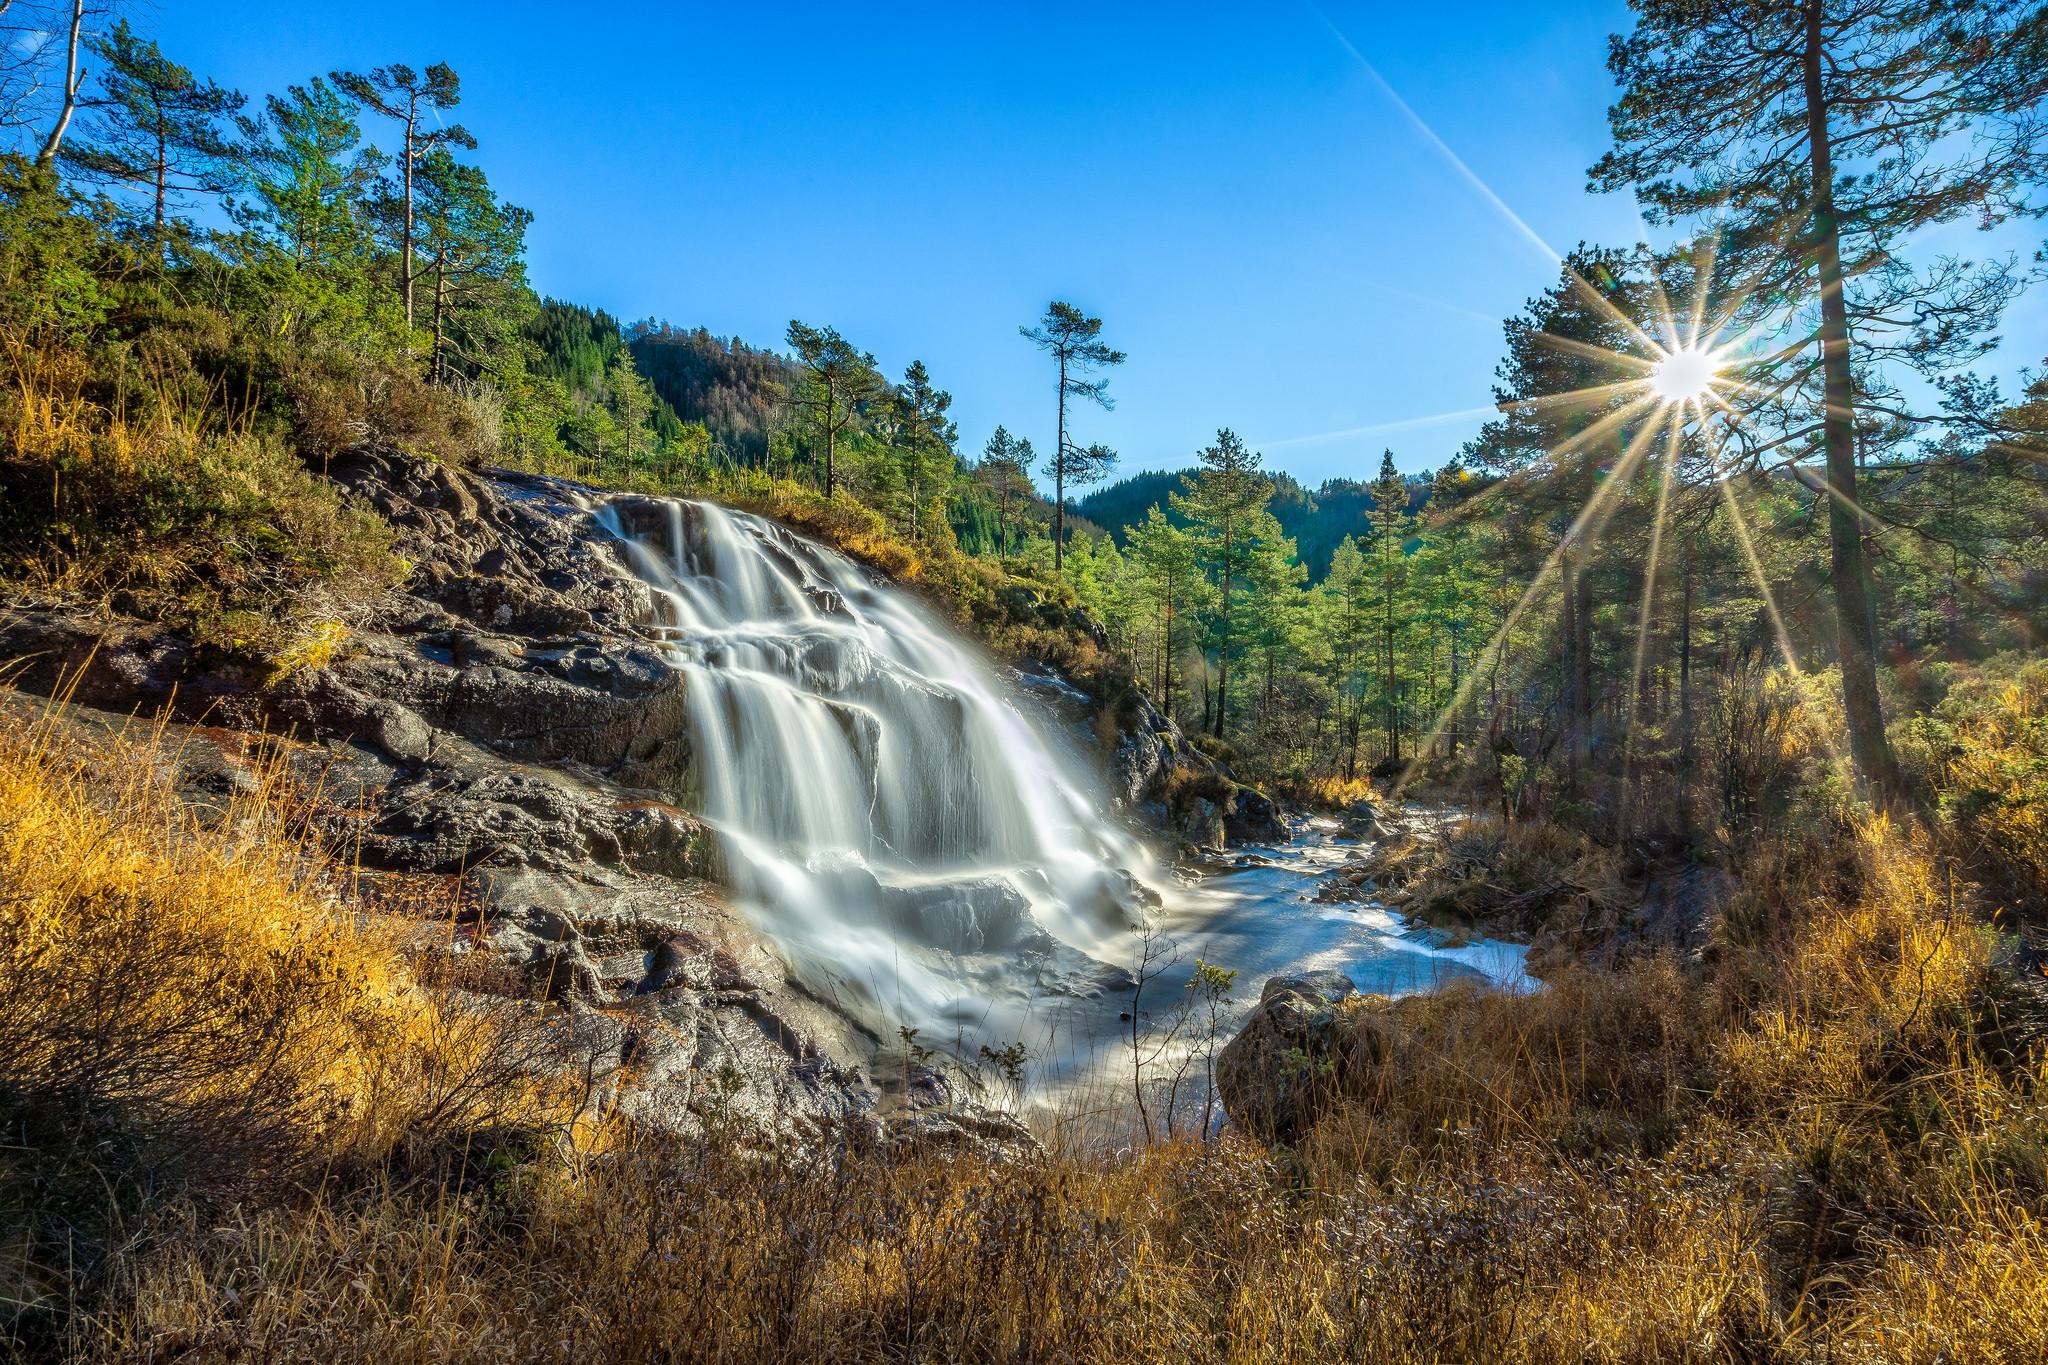 обои Norwegian, лес, деревья, скалы картинки фото